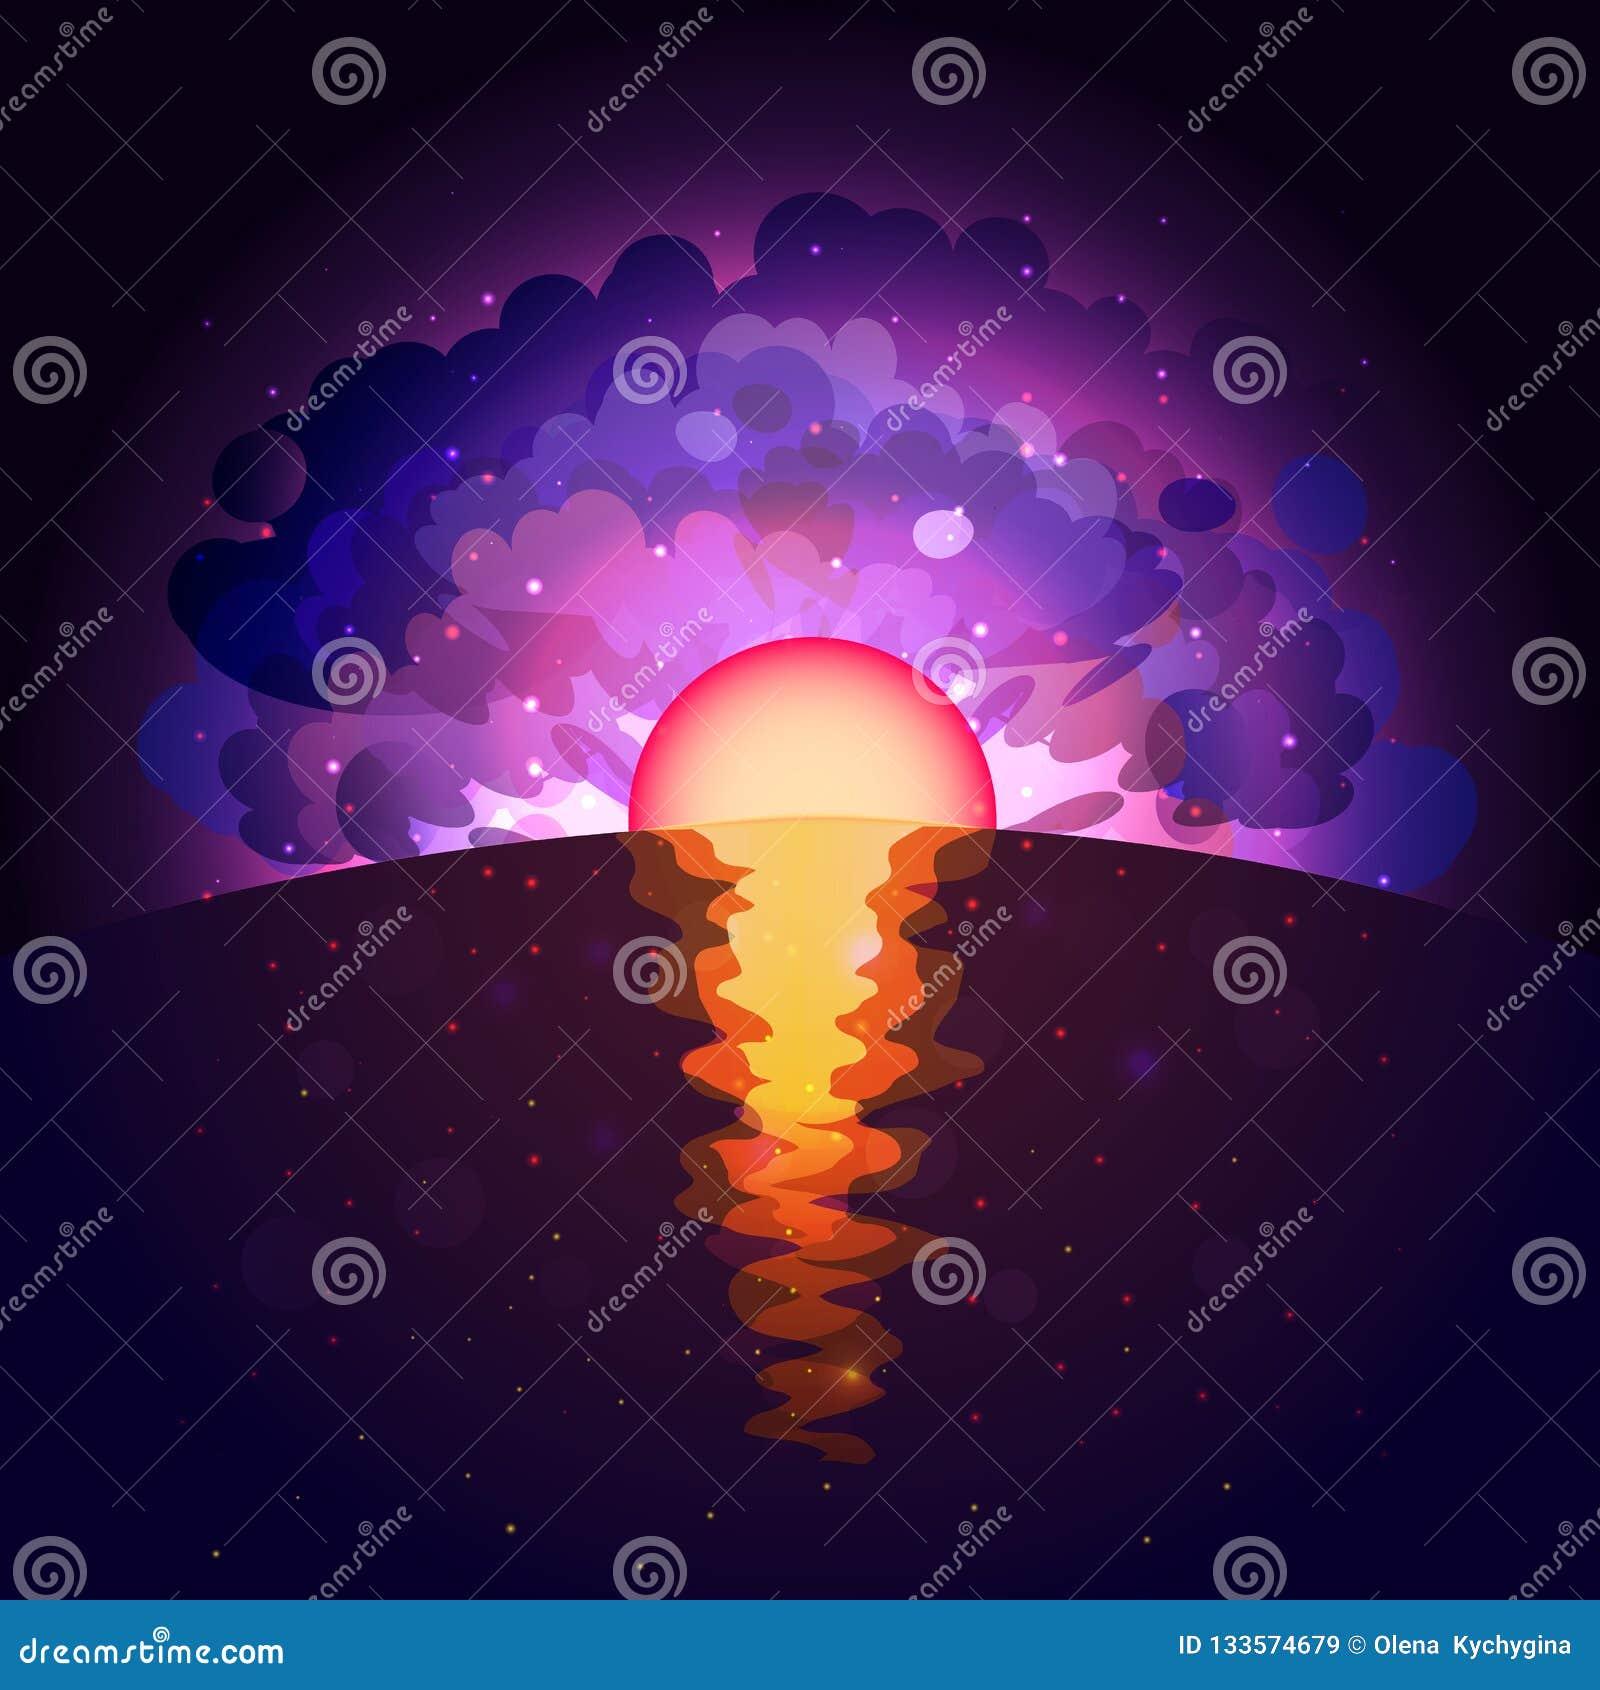 Sunrise on infinite space background. Sunset sea paper art style.